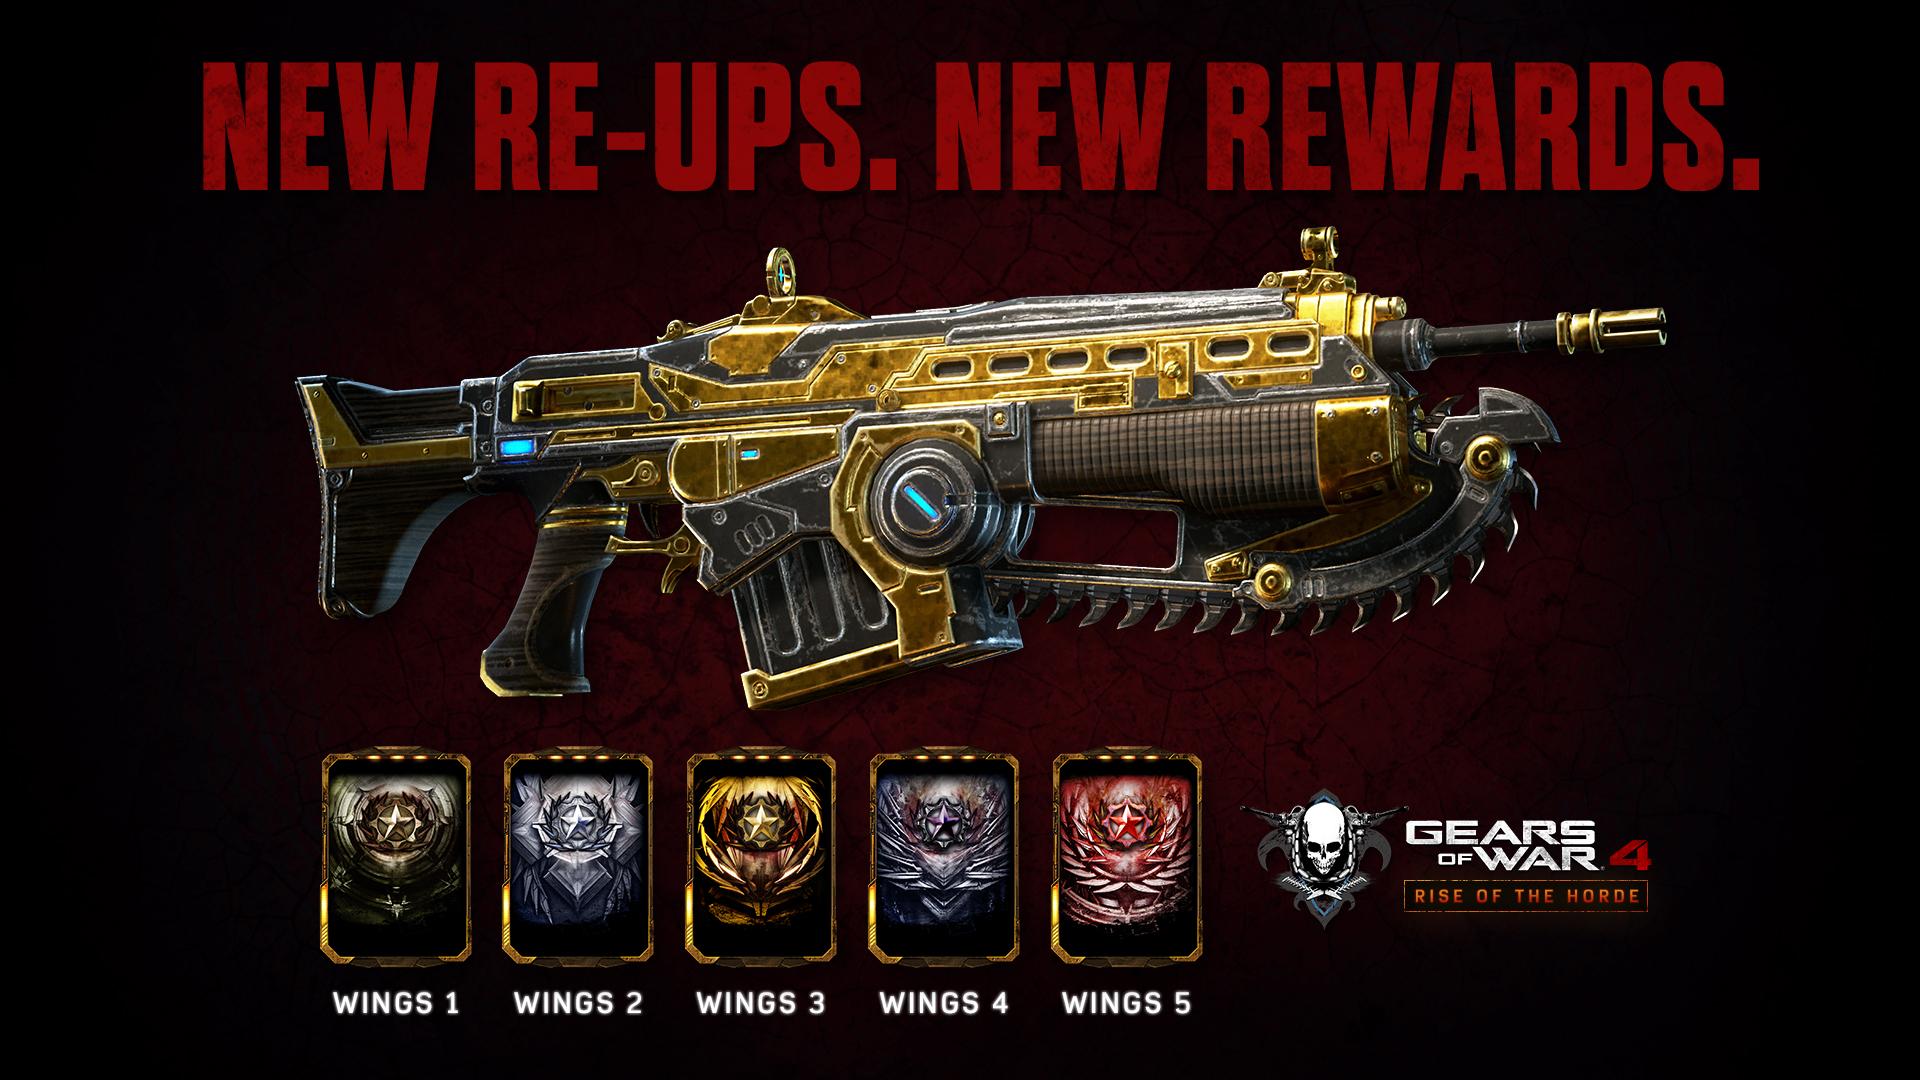 Gears Of War 4 Rise Of The Horde Community Gears Of War